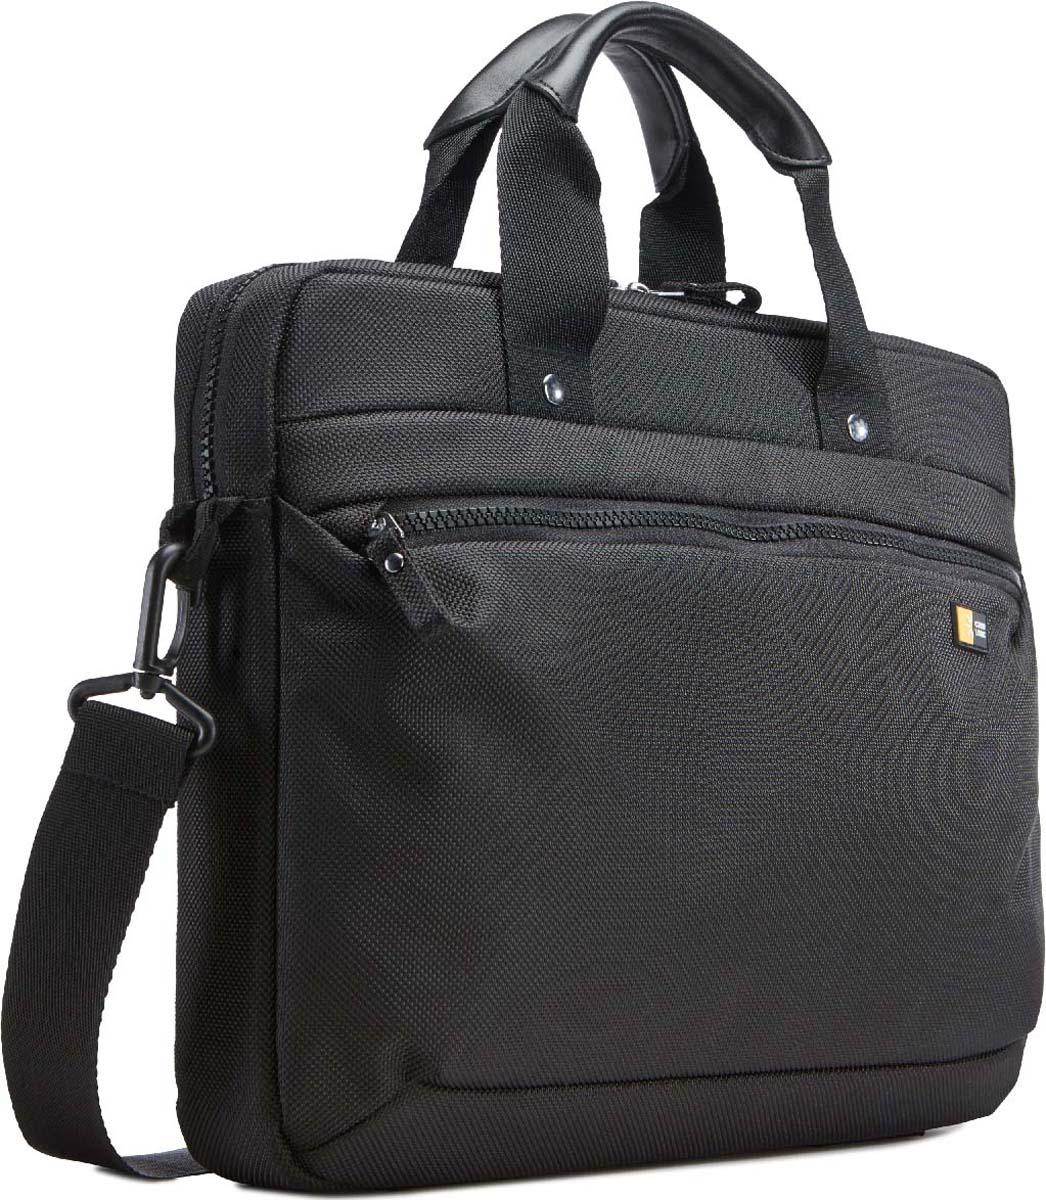 Case Logic Bryker Attache Black, сумка для ноутбука 13,3